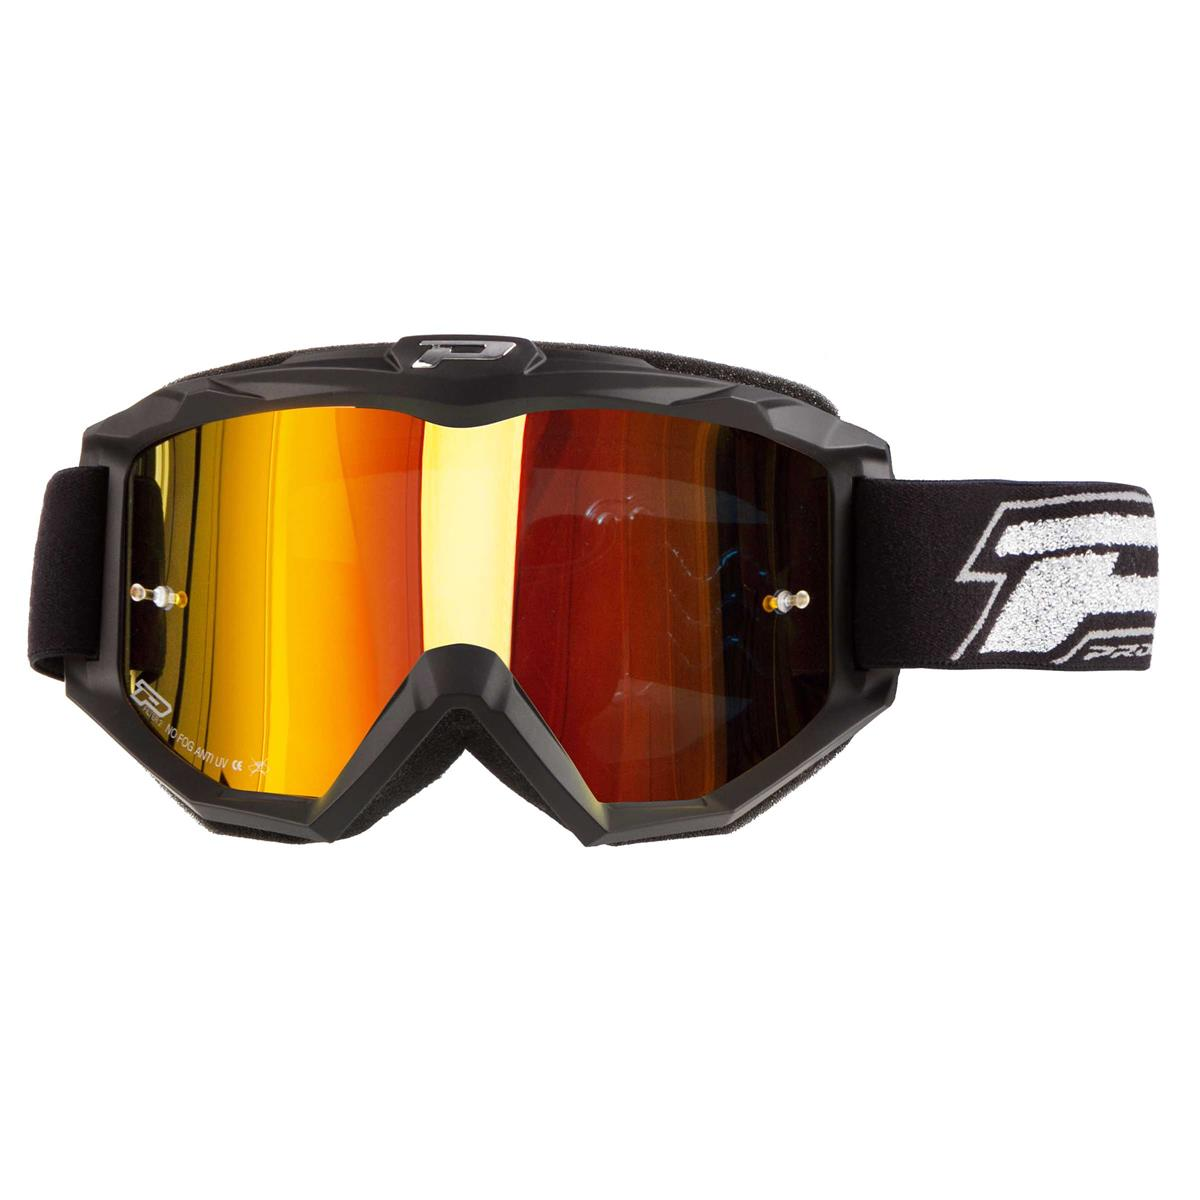 ProGrip Crossbrille 3204 FL Shiny Rot Mirrored